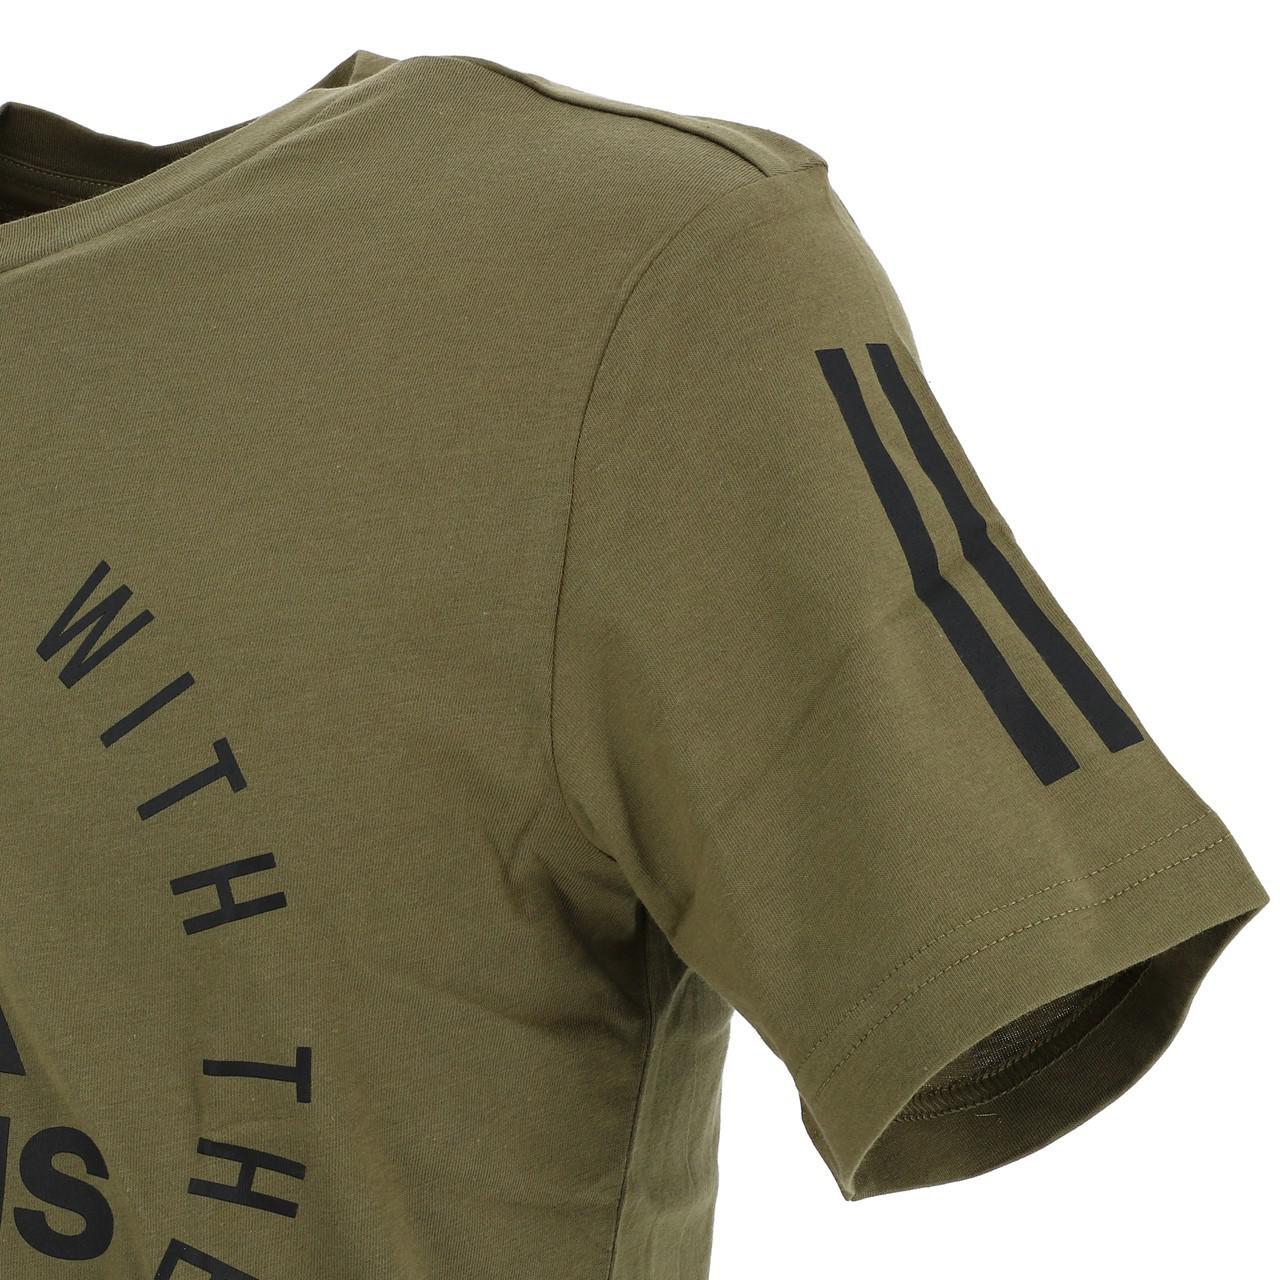 Short-Adidas-Sid-Khaki-Mc-Tee-Green-18234-New thumbnail 3